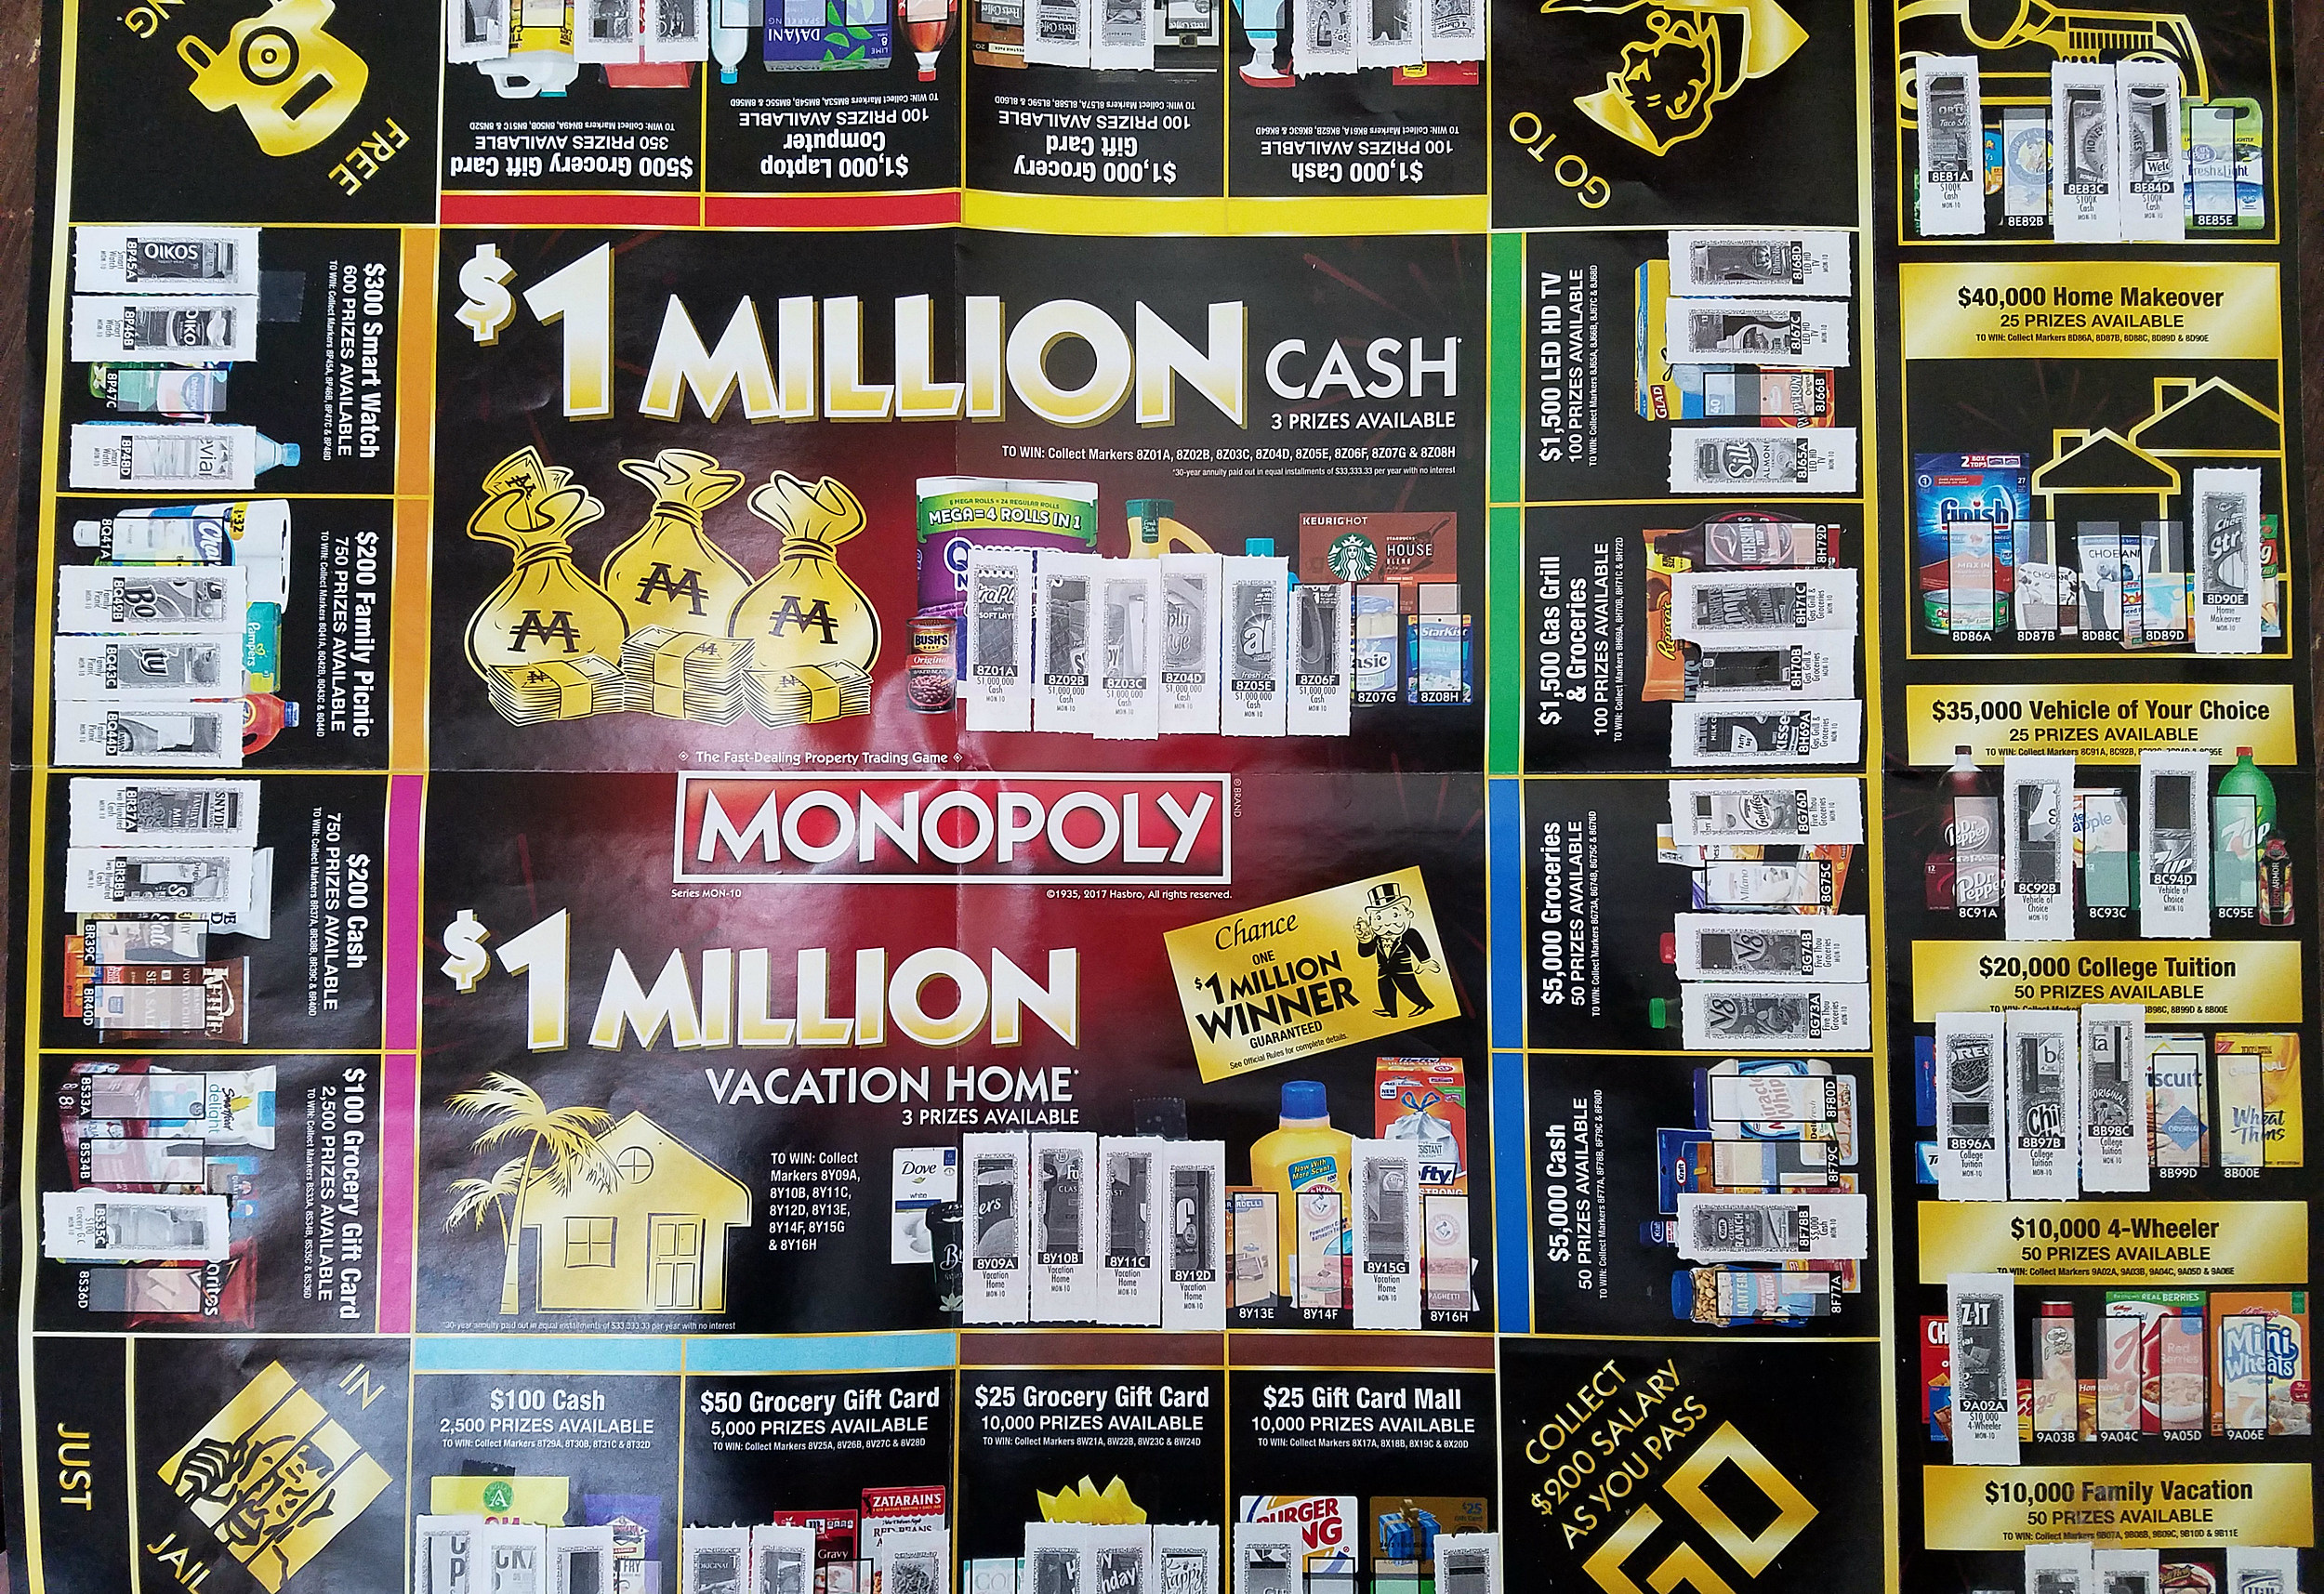 Safeway Monopoly 2017: Montana's Got Some Big Winners, Just Not Me